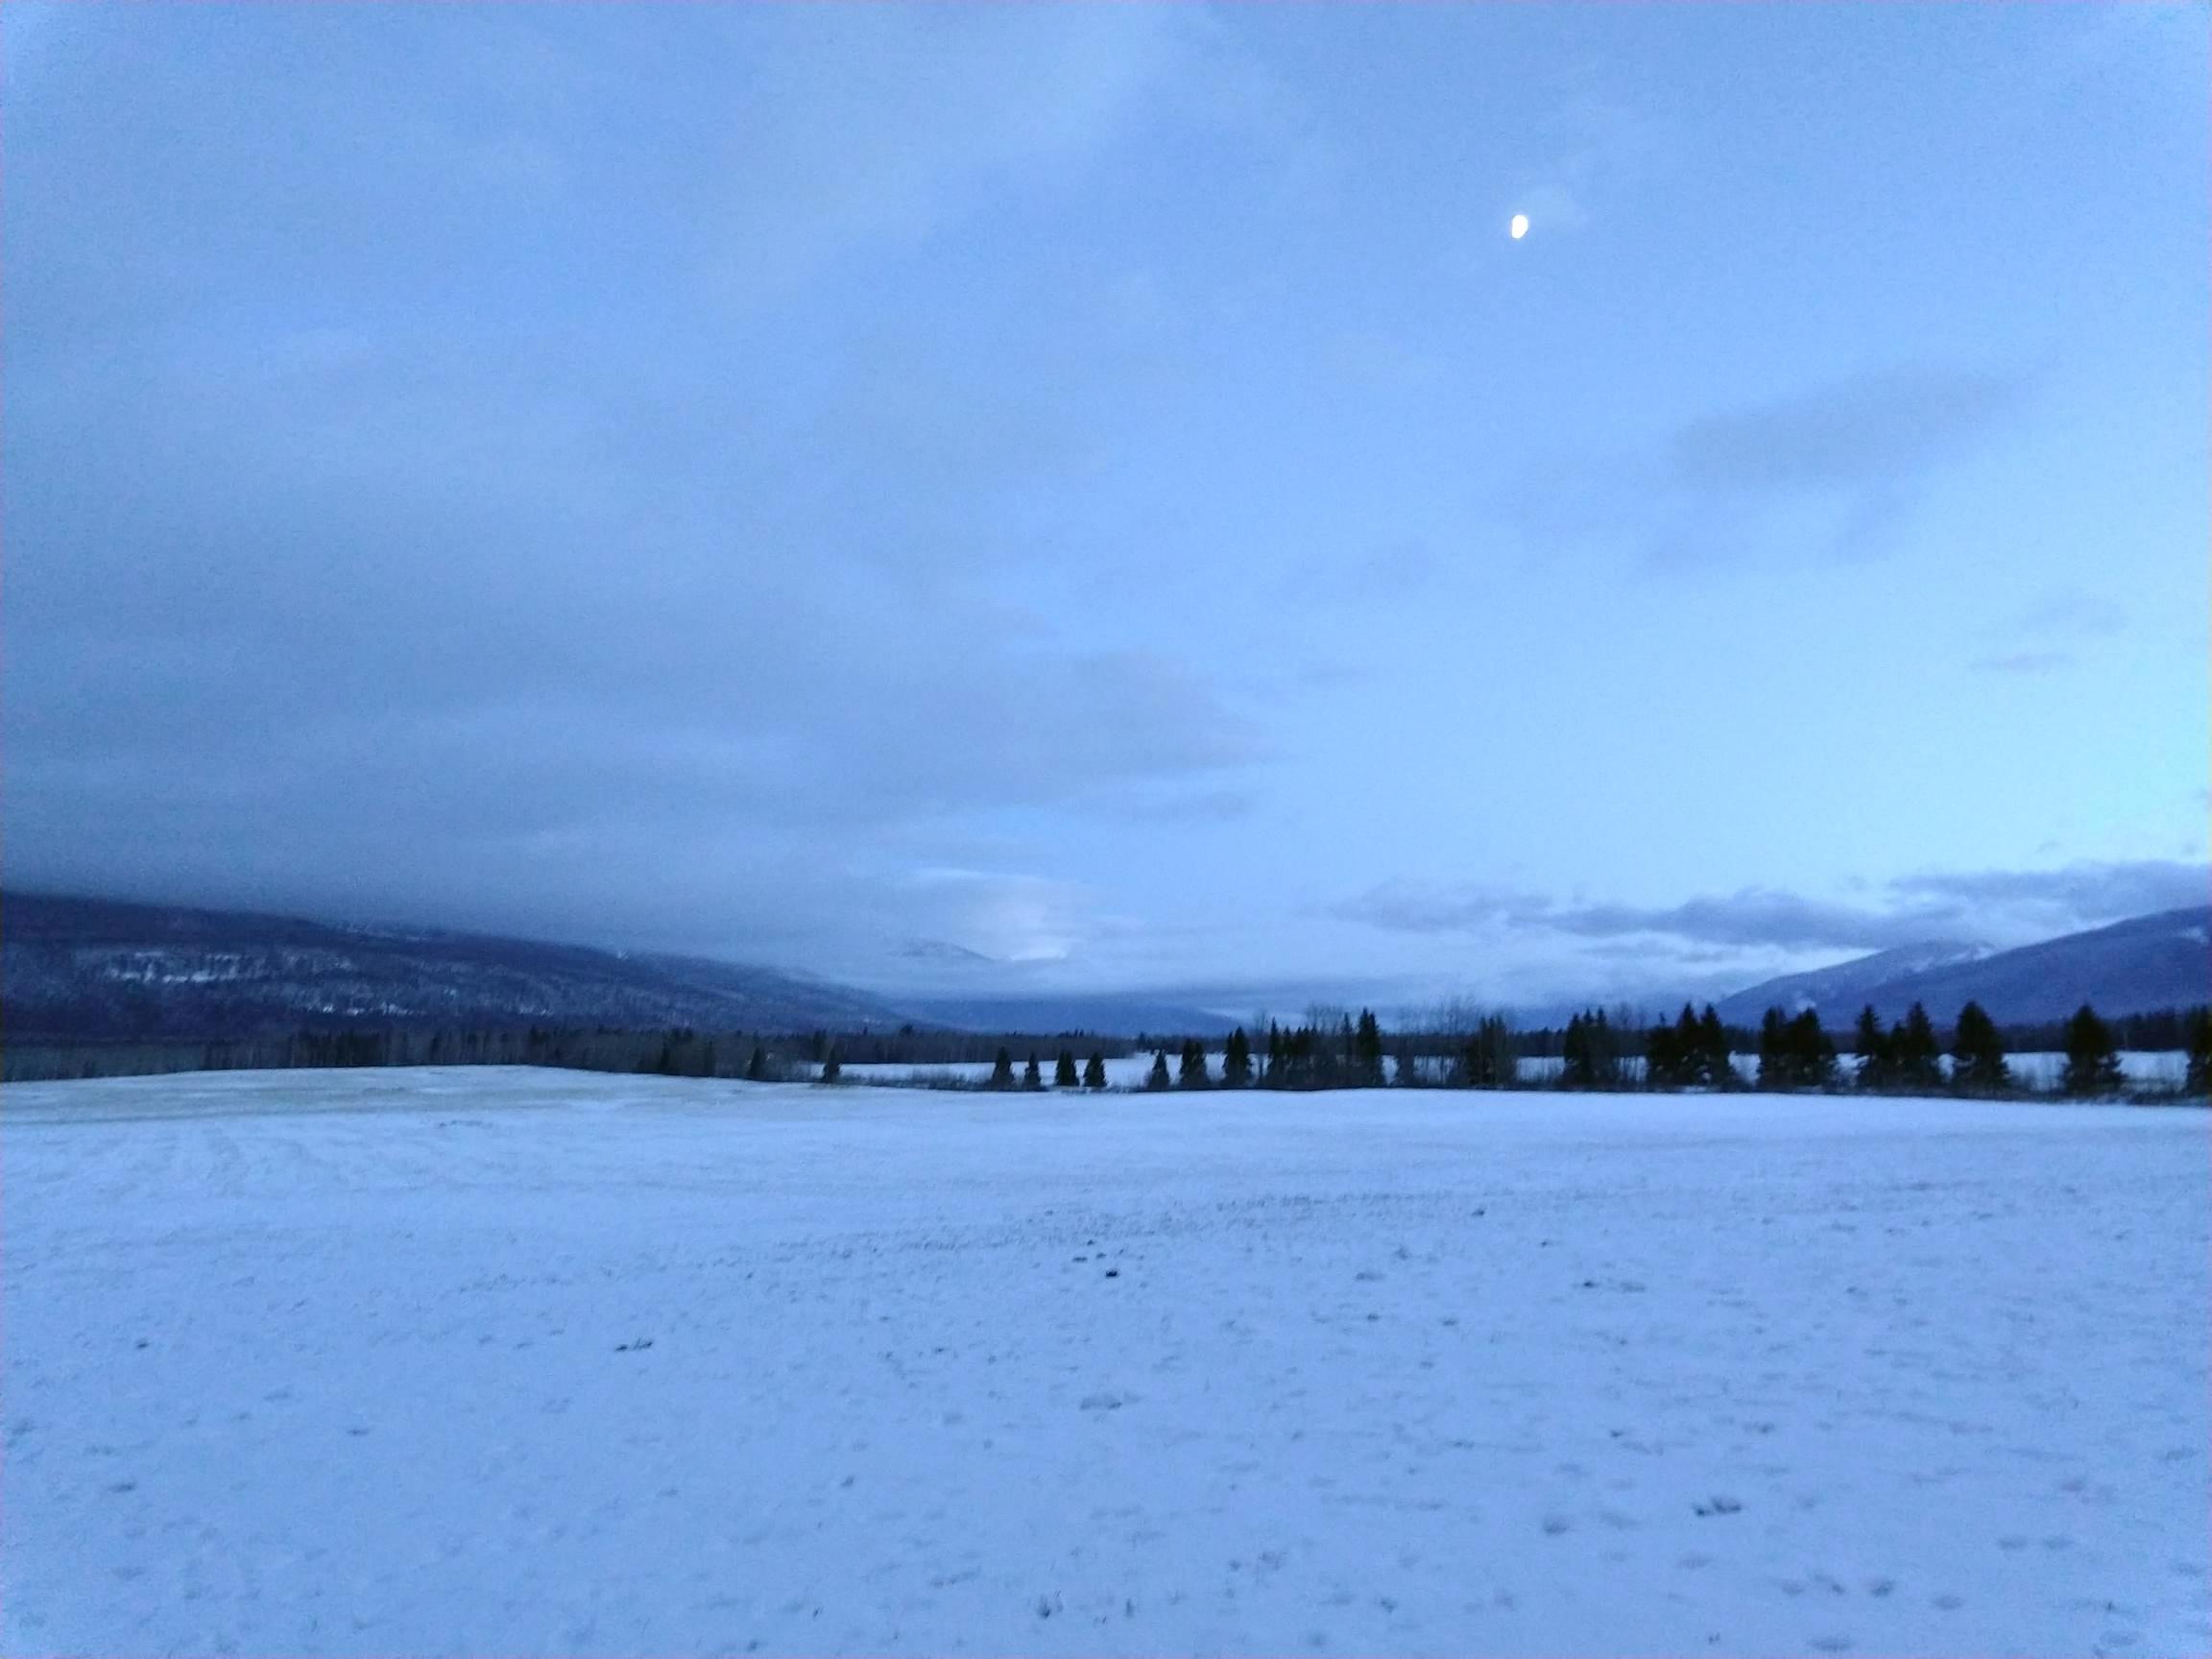 Backfield at dusk